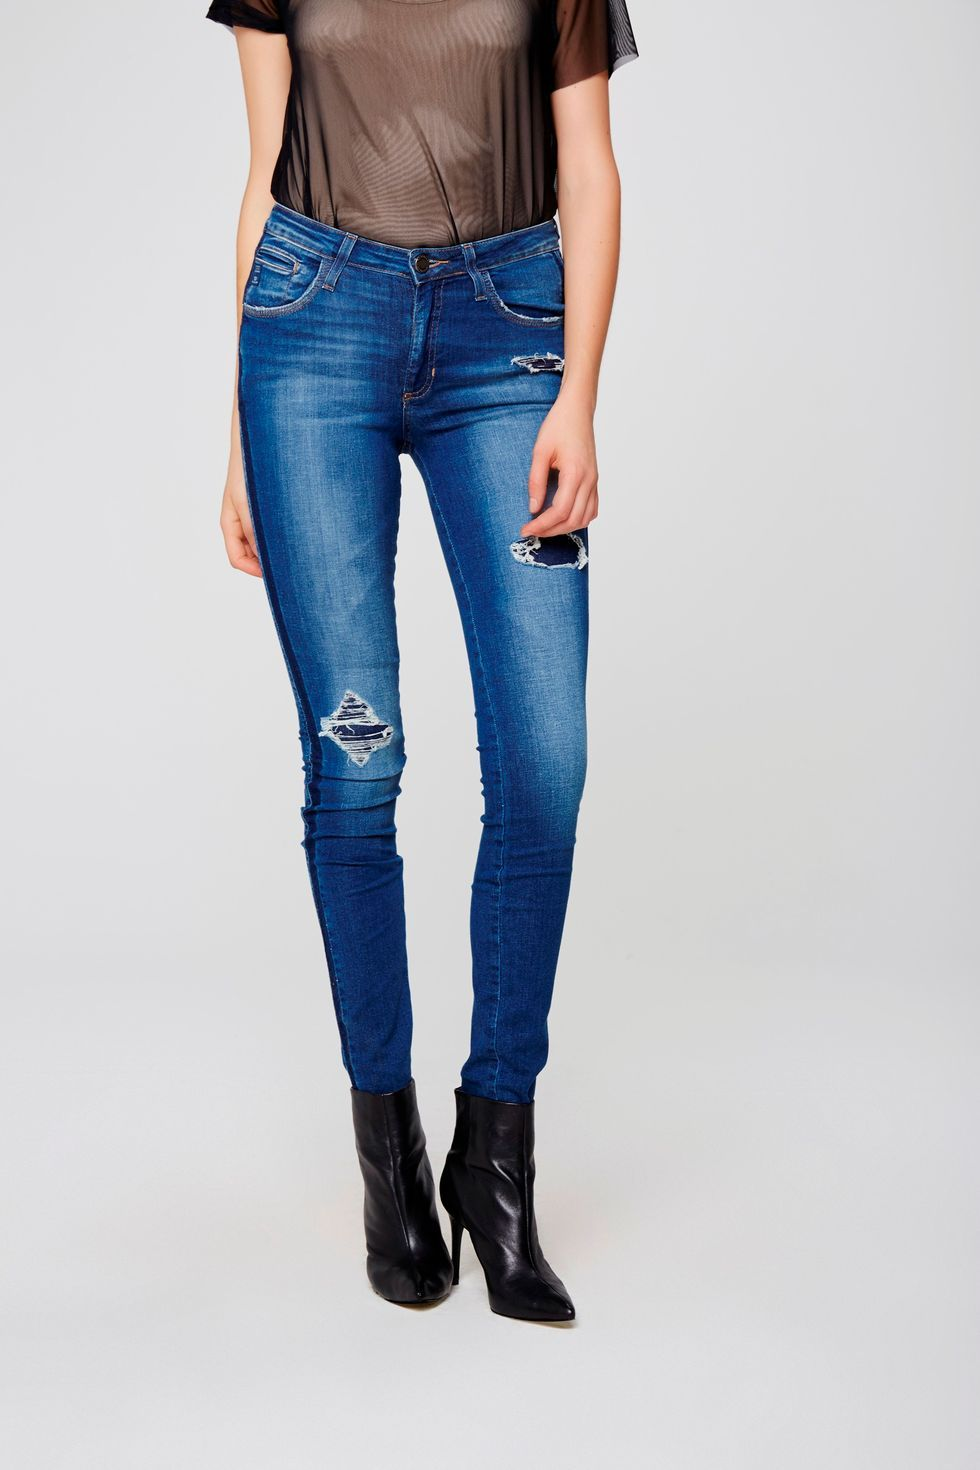 1373cbcf9 Calça Jeans Skinny Rasgada Feminina - Damyller